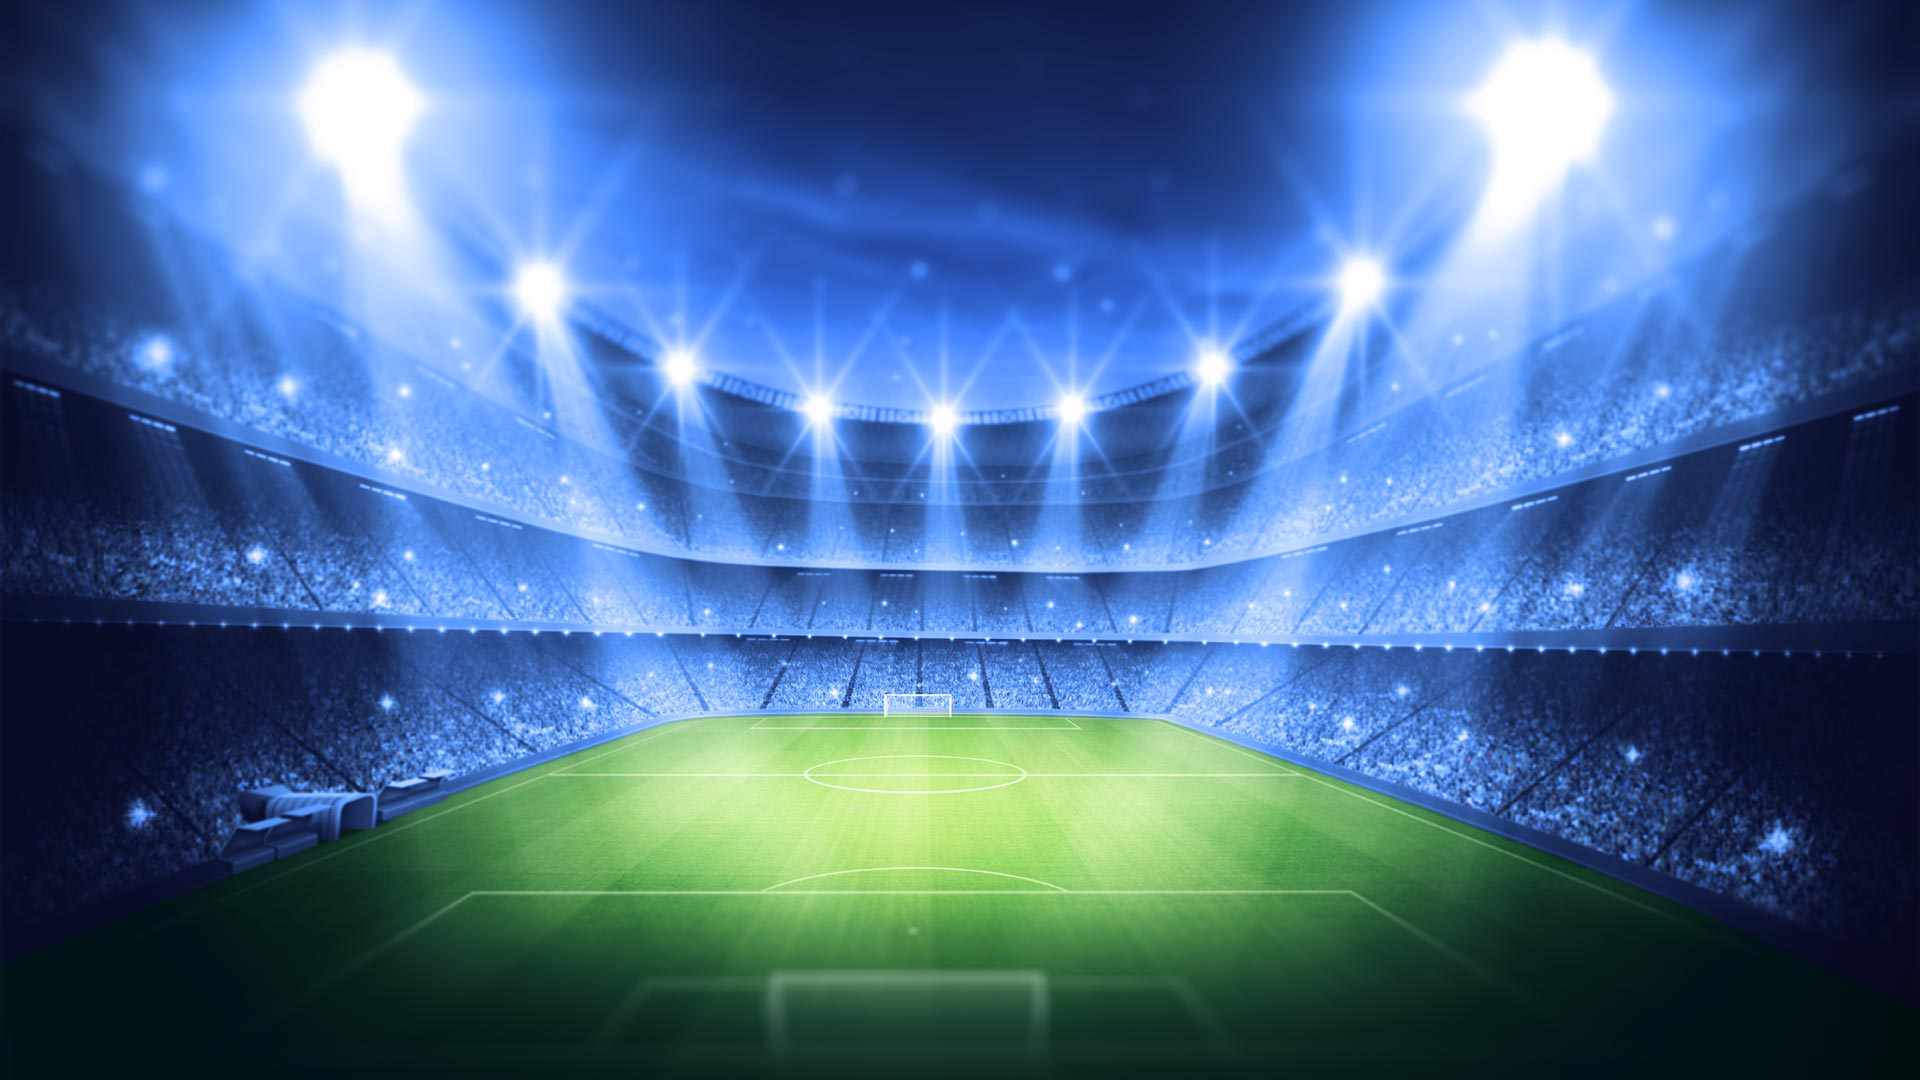 Champions League, Juventus-Barcellona e Barcellona-Juventus trasmesse in chiaro da Mediaset